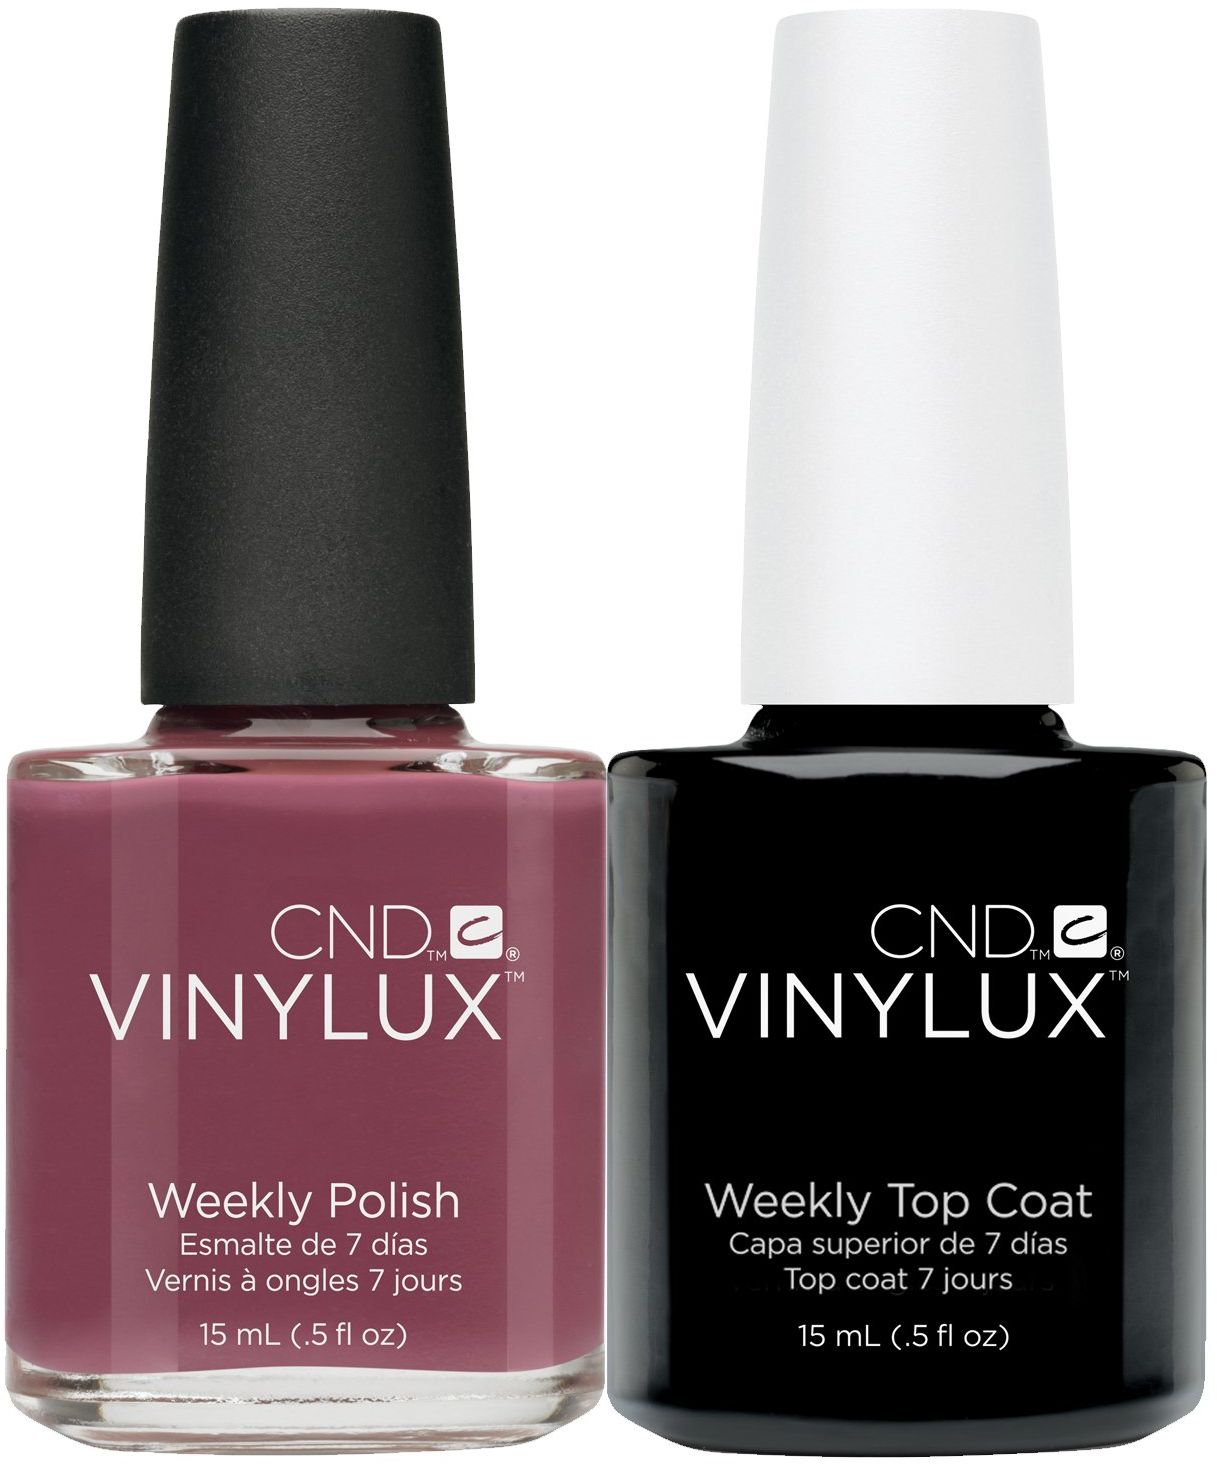 CND Vinylux Married to the Mauve plus Top Coat 15 ml, 1 opakowanie (1 x 30 ml)